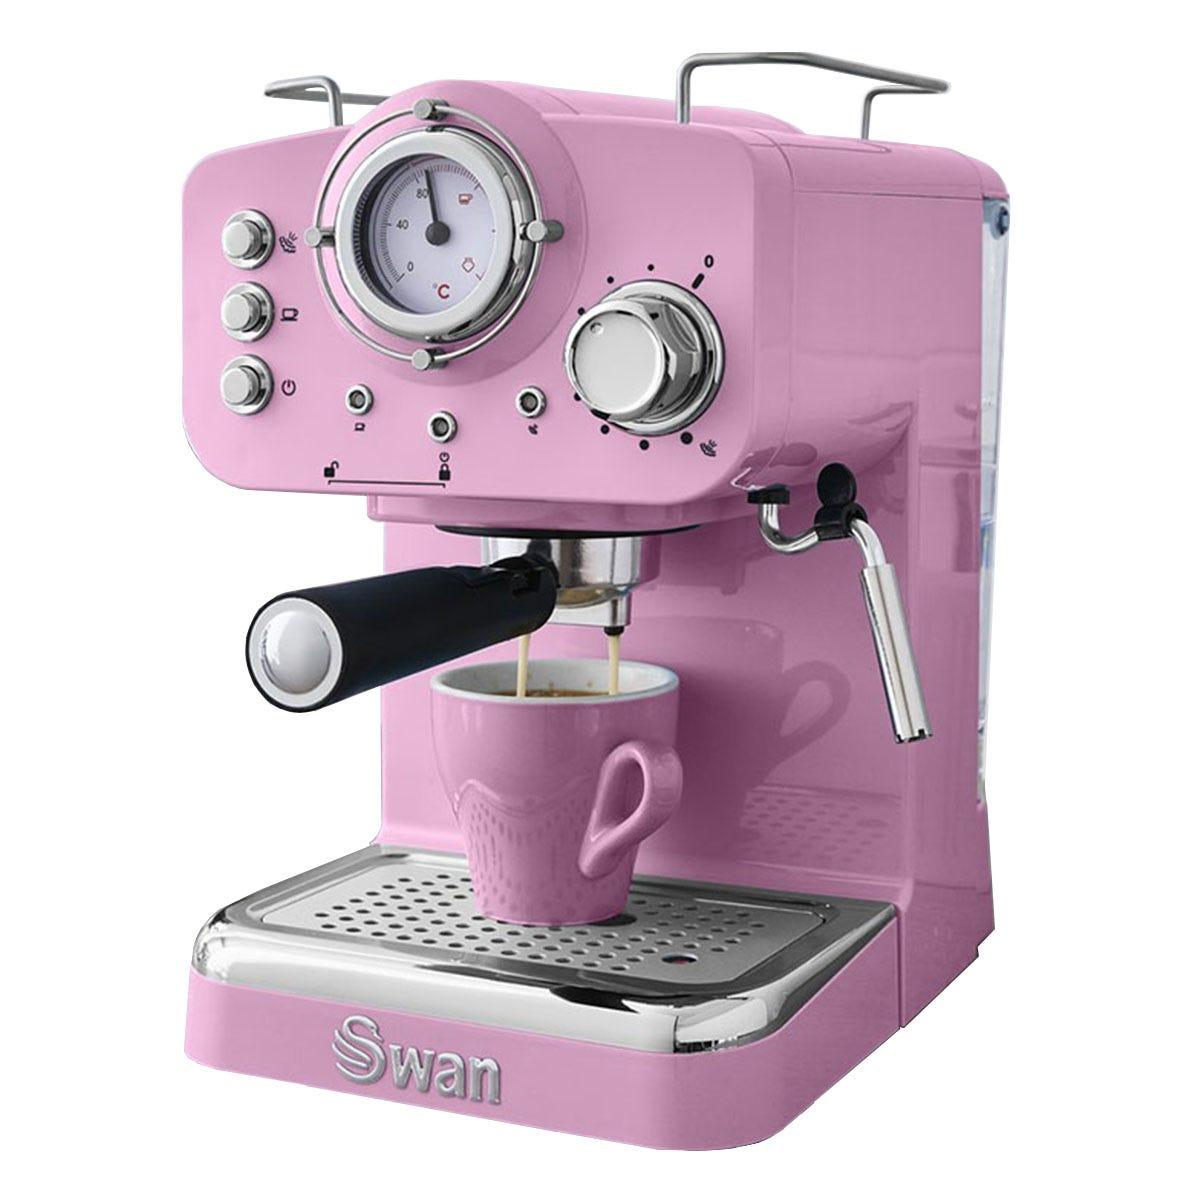 Swan SK22110PN 1100W 1.2L Retro Pump Espresso Coffee Machine - Pink